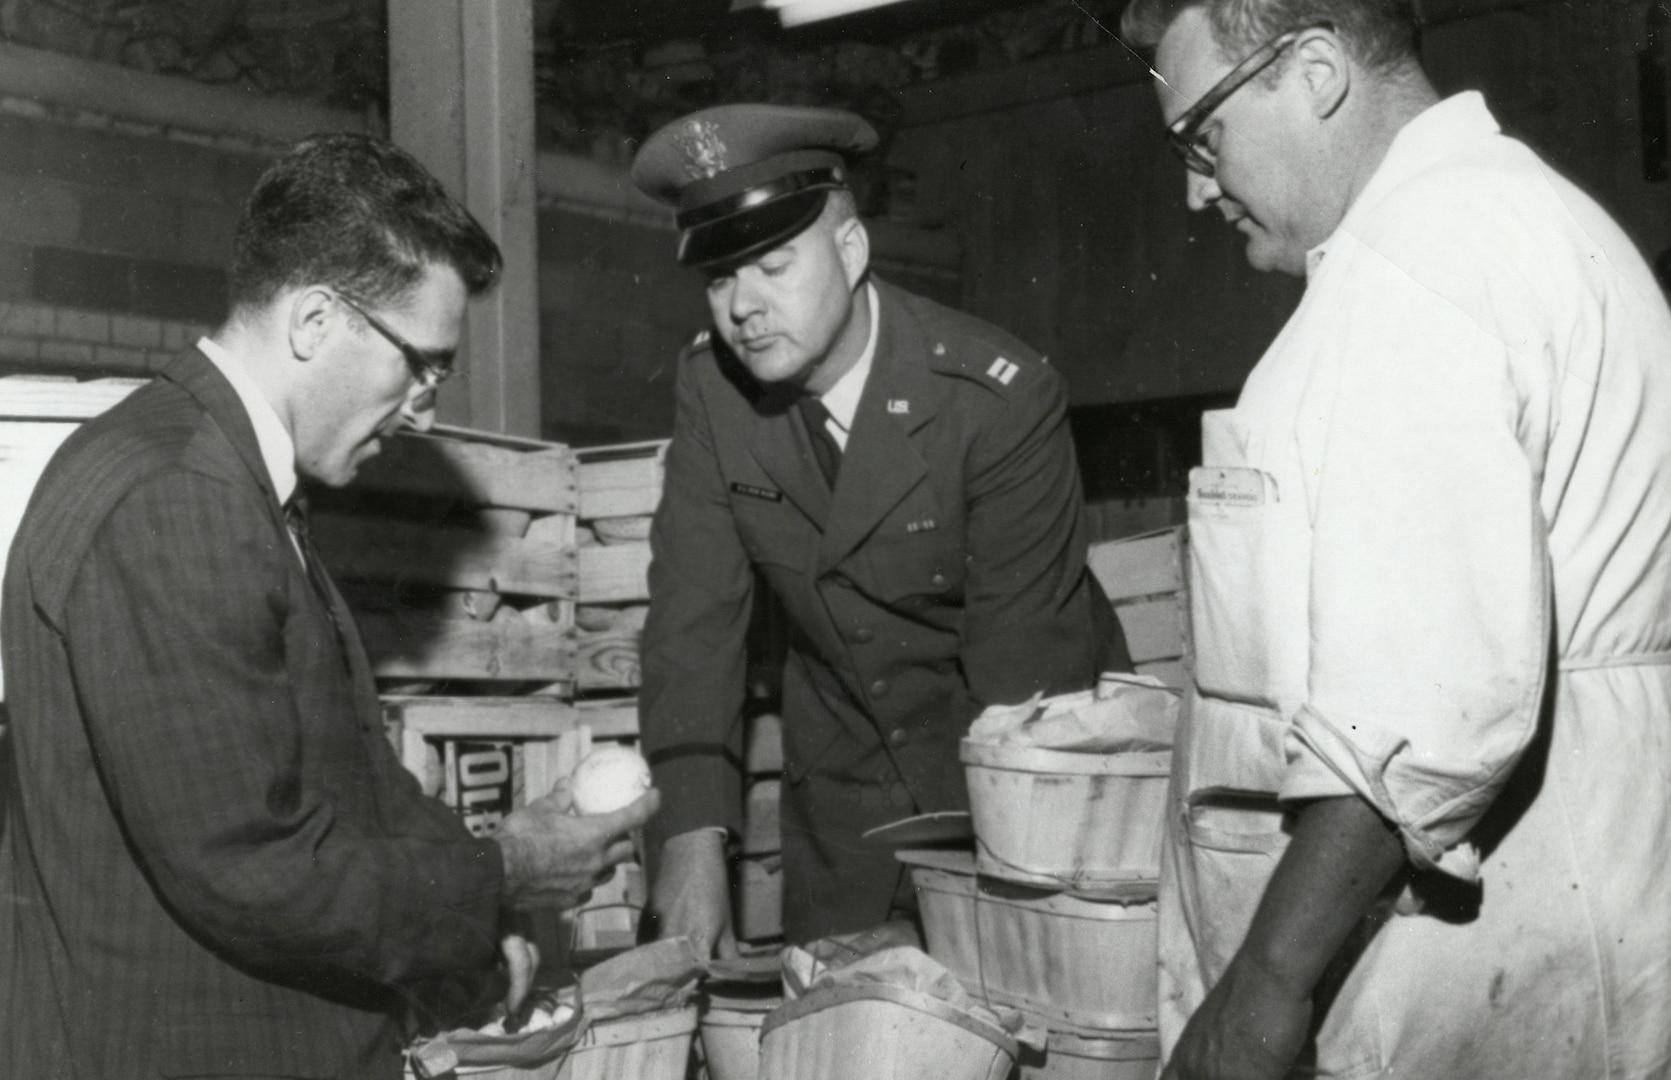 Three gentlemen conduct a food inspection.